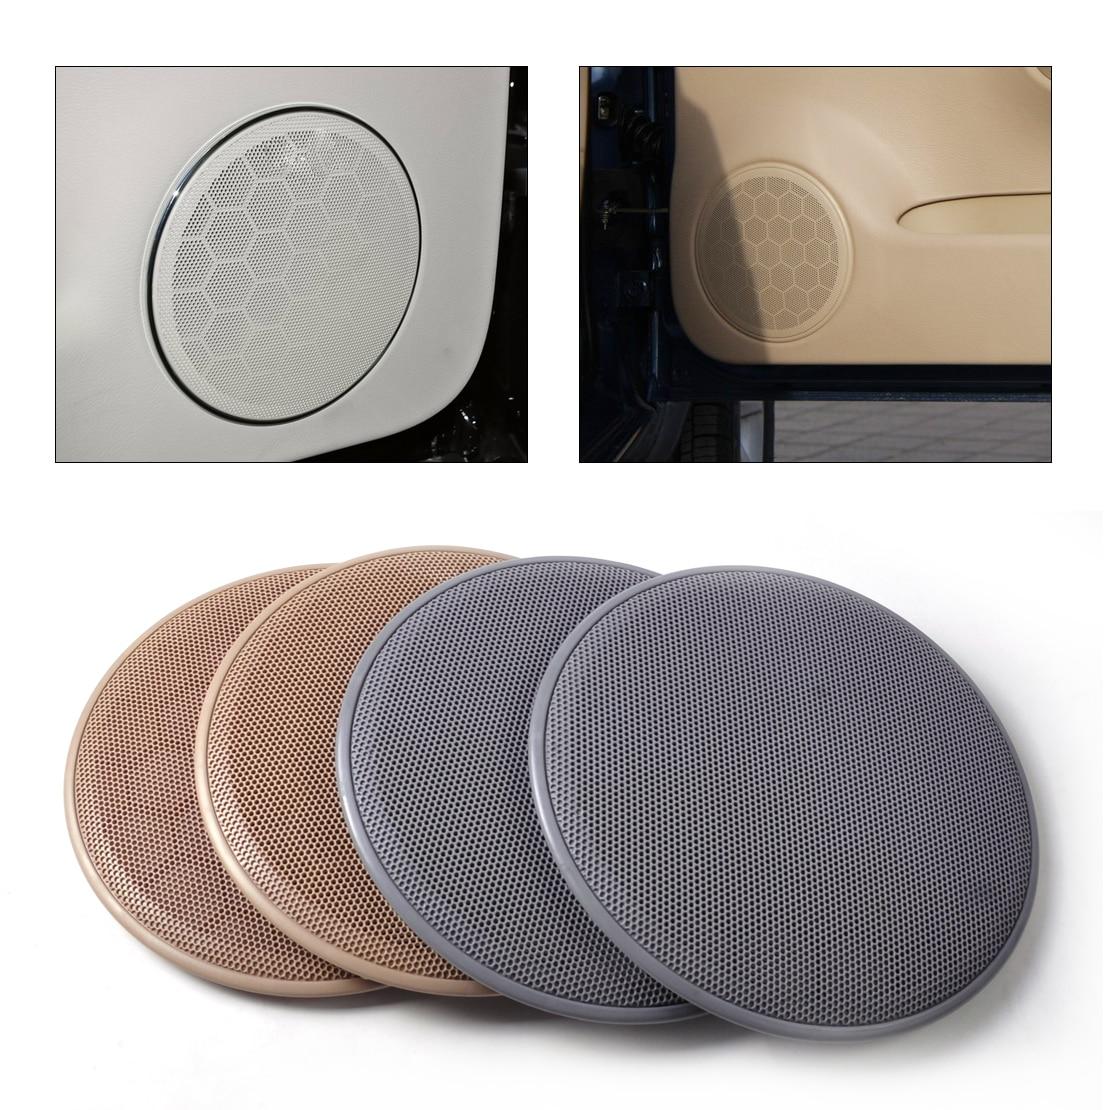 dwcx 2pcs door loud speaker cover grill 3b0868149 for volkswagen passat b5 jetta mk4 golf gti. Black Bedroom Furniture Sets. Home Design Ideas